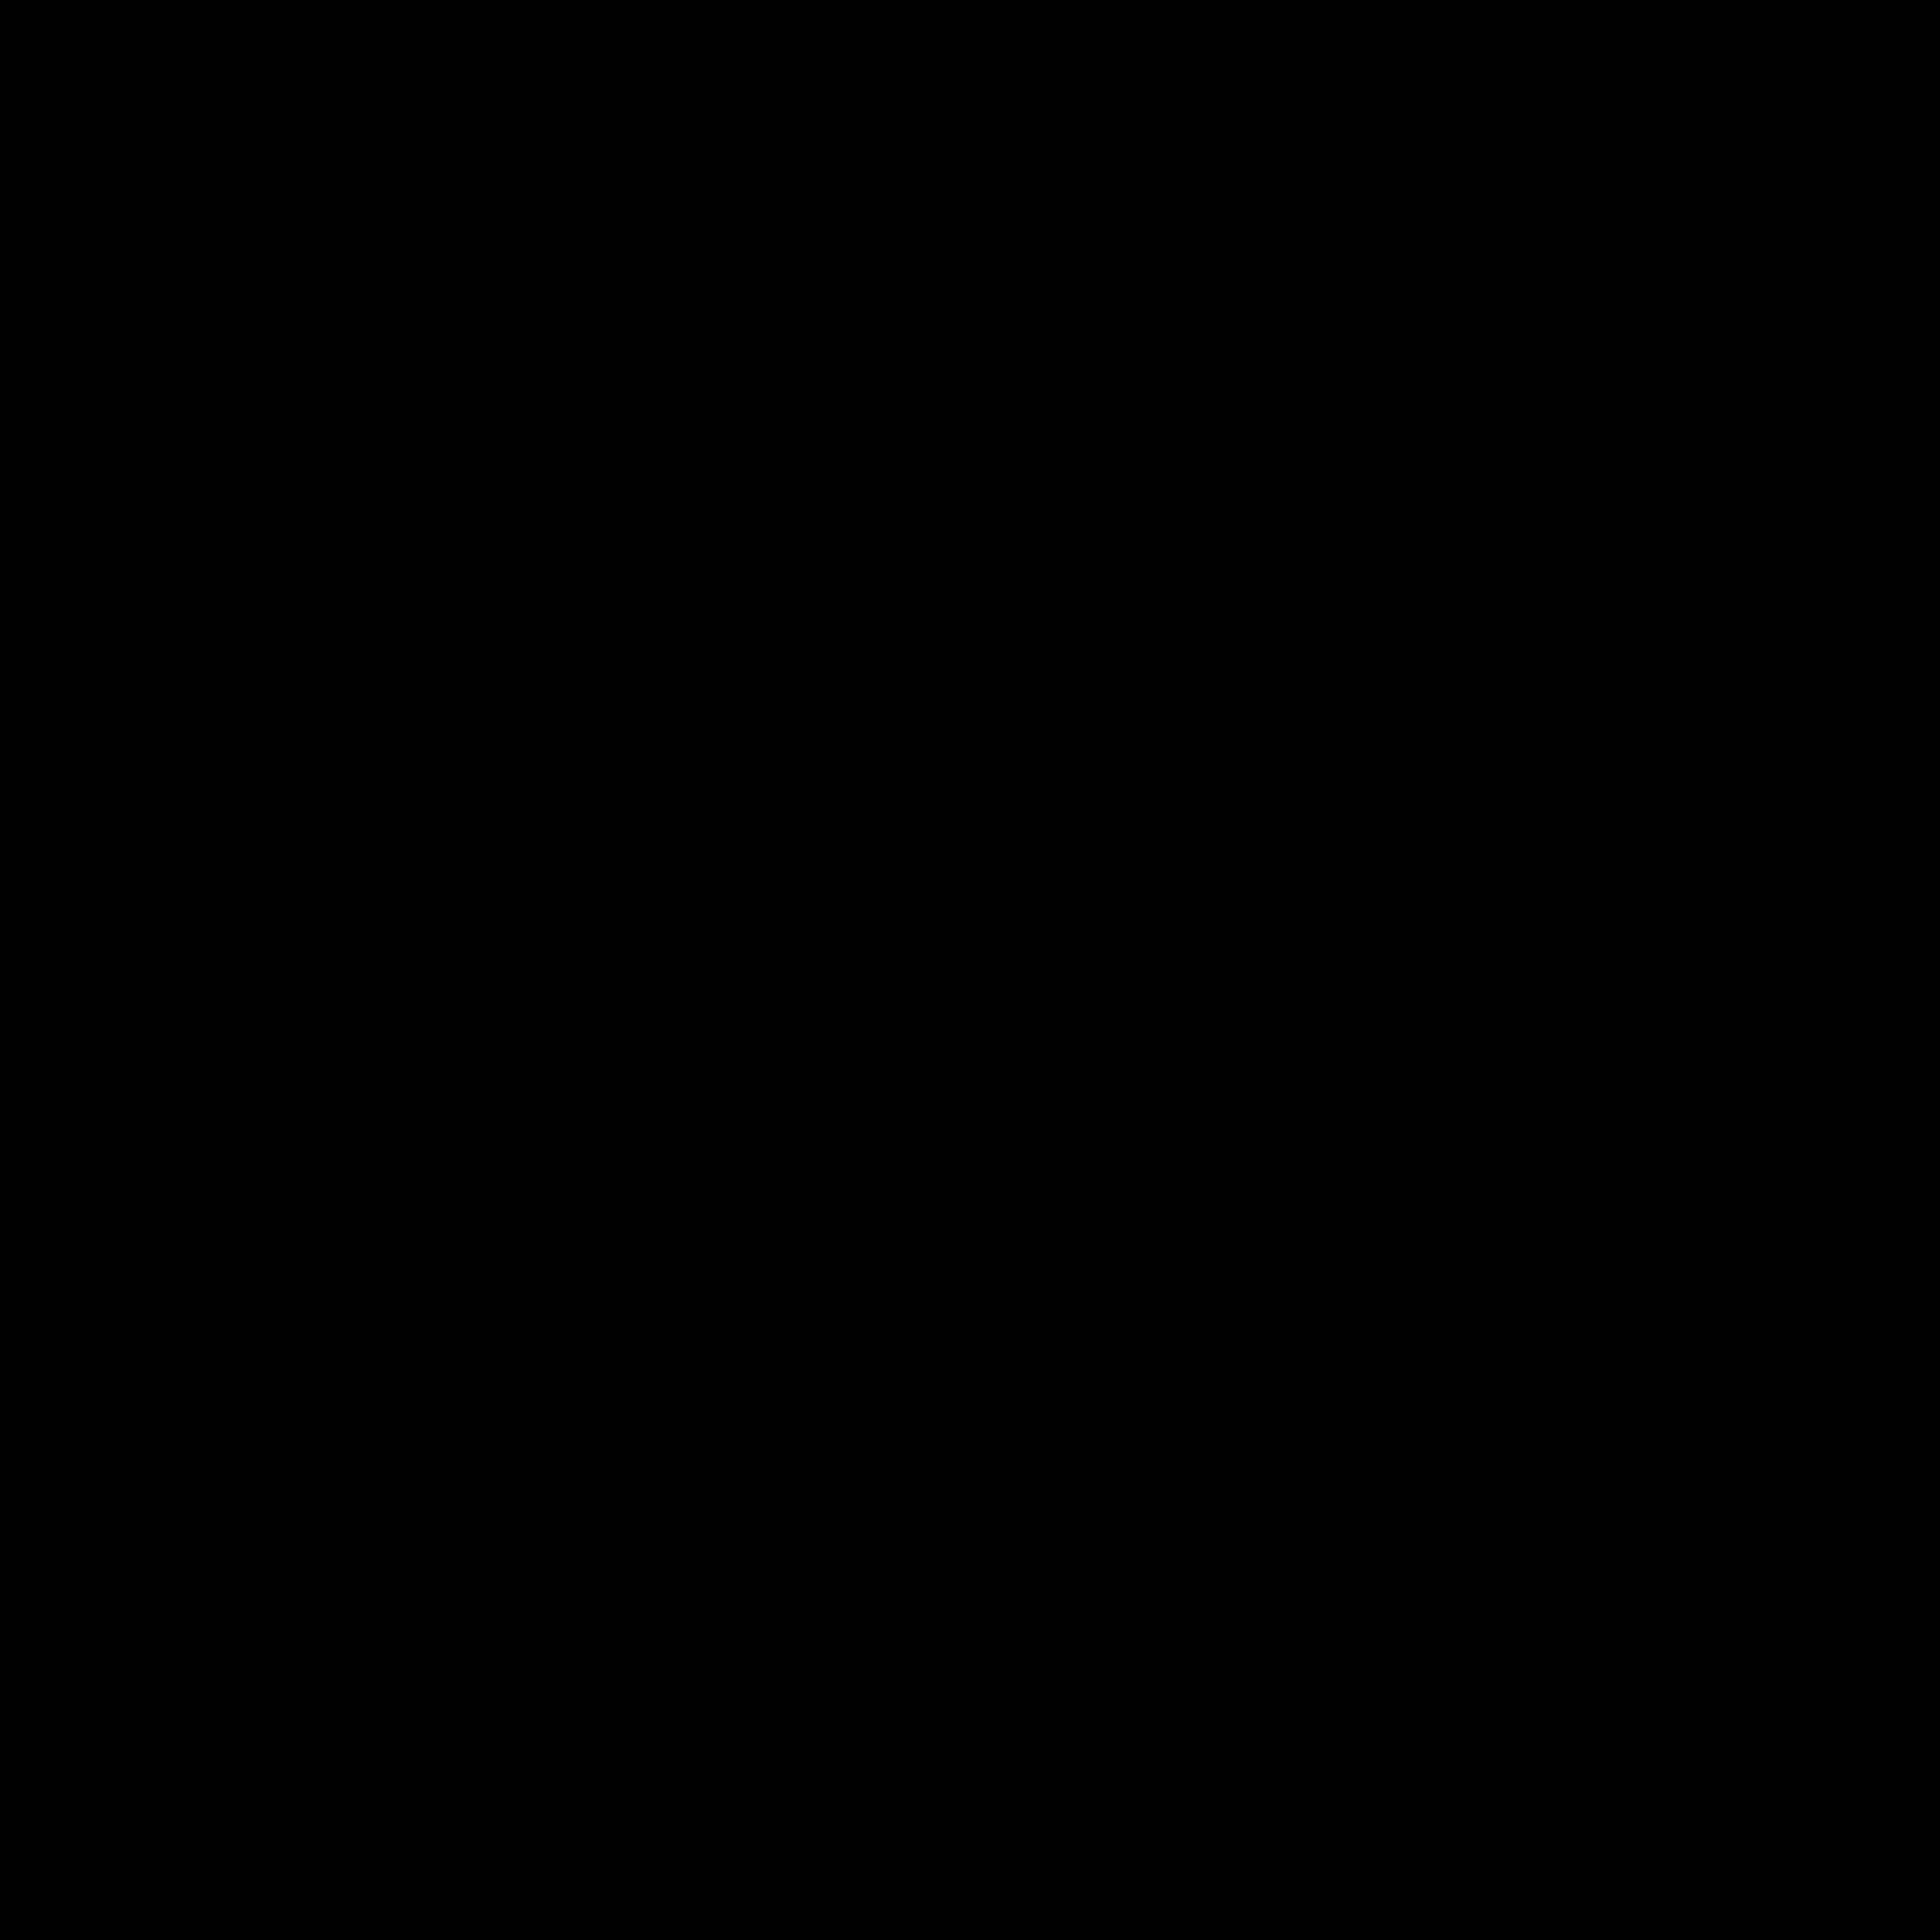 vegan symbol emojis copyright free clipart copypaste png image file 5000x5000px png biocorpaavc Gallery